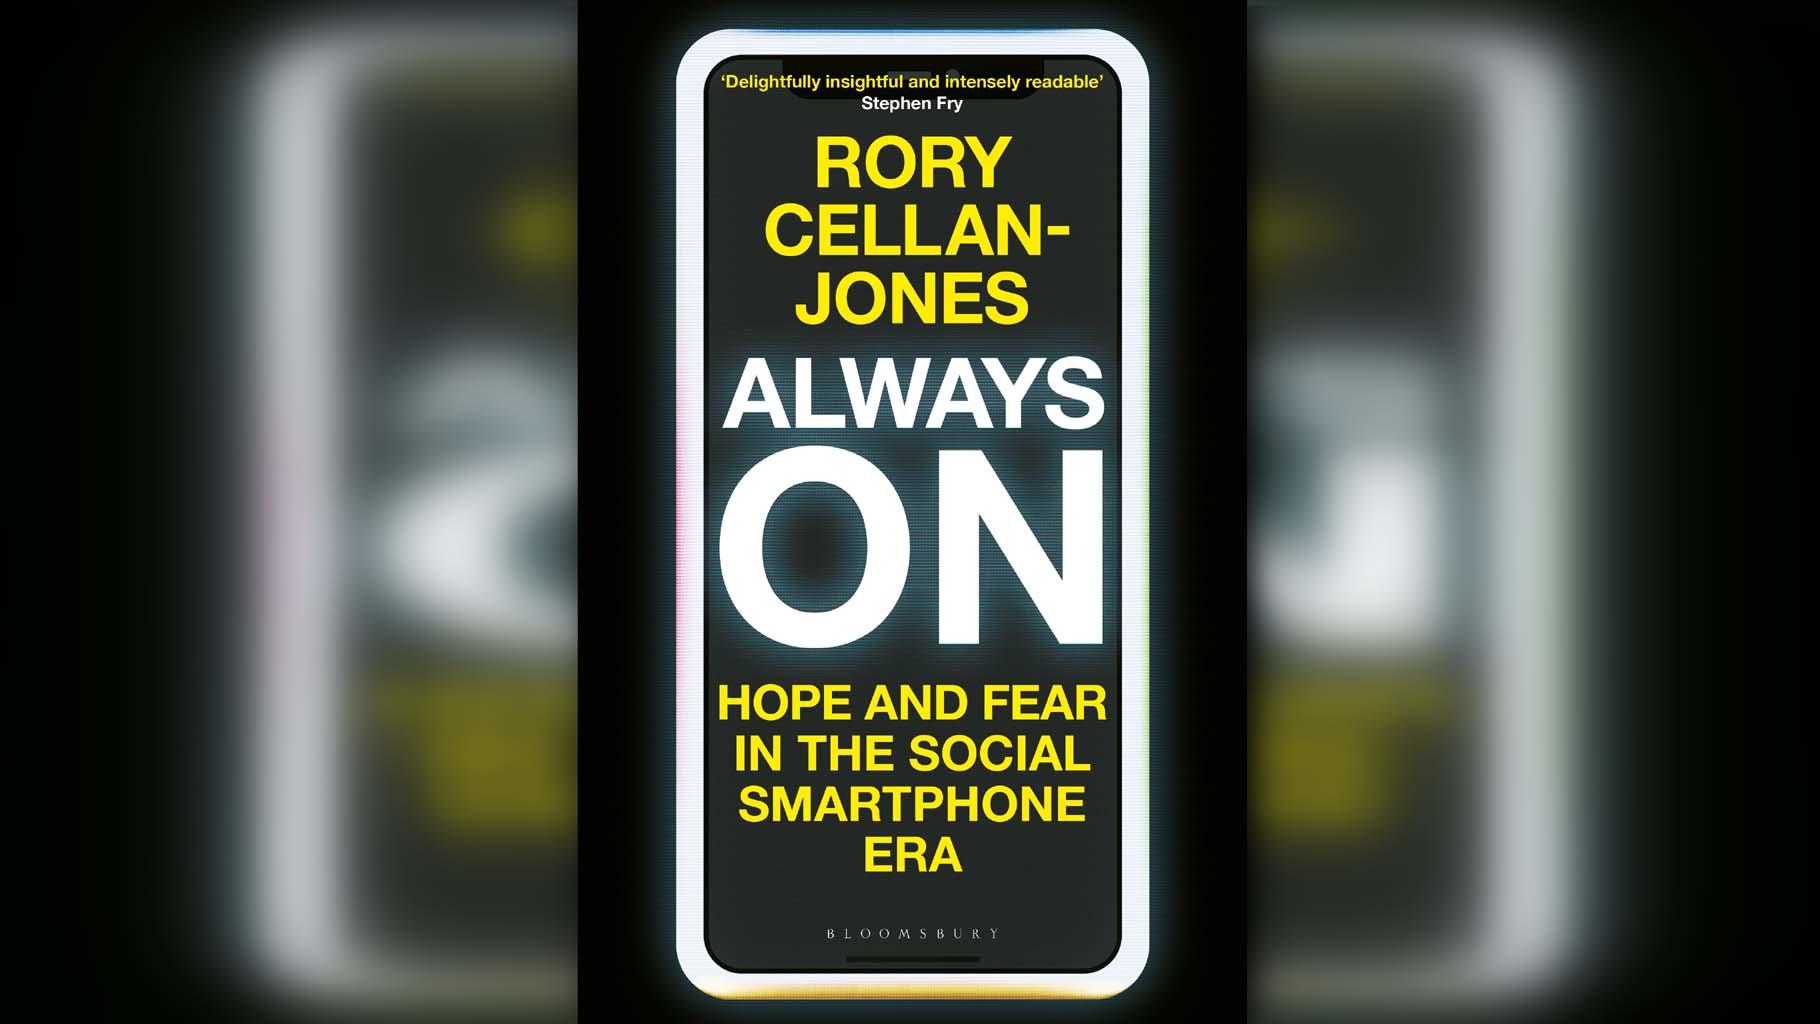 Coronavirus pandemic, Smartphone, Always on, Bookexcerpt